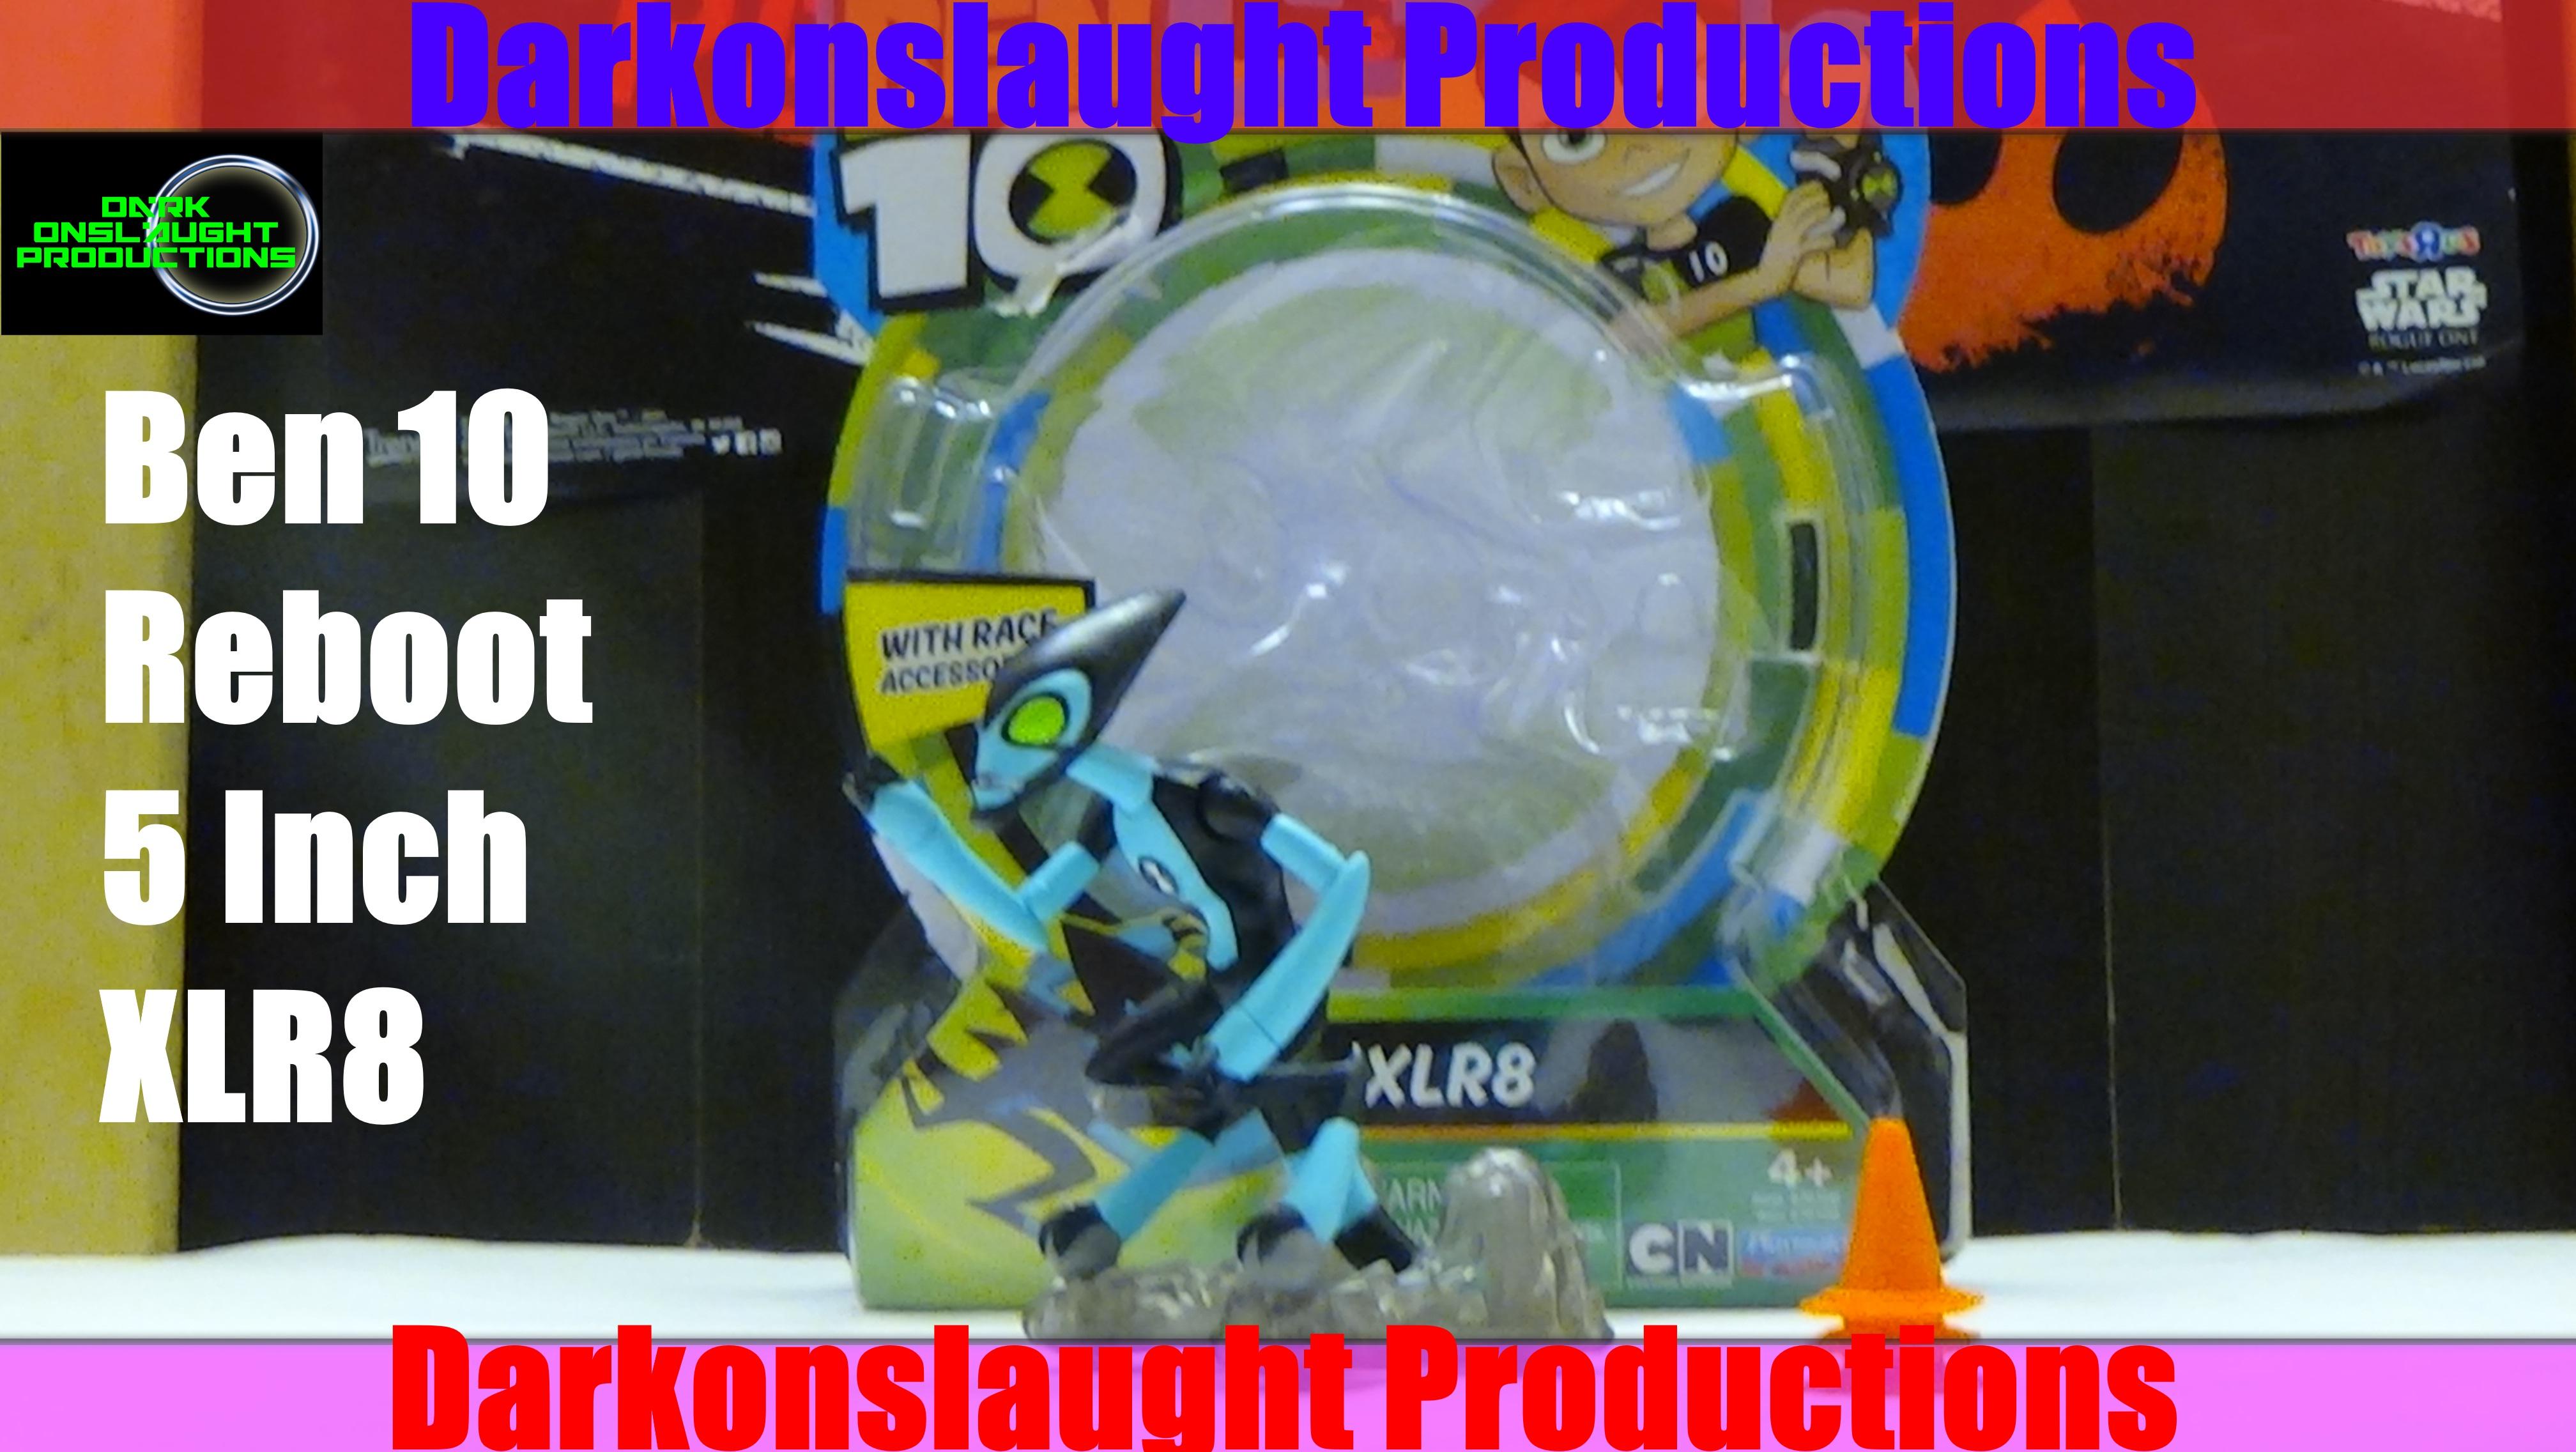 Review Ben 10 Reboot 5 Inch XLR8